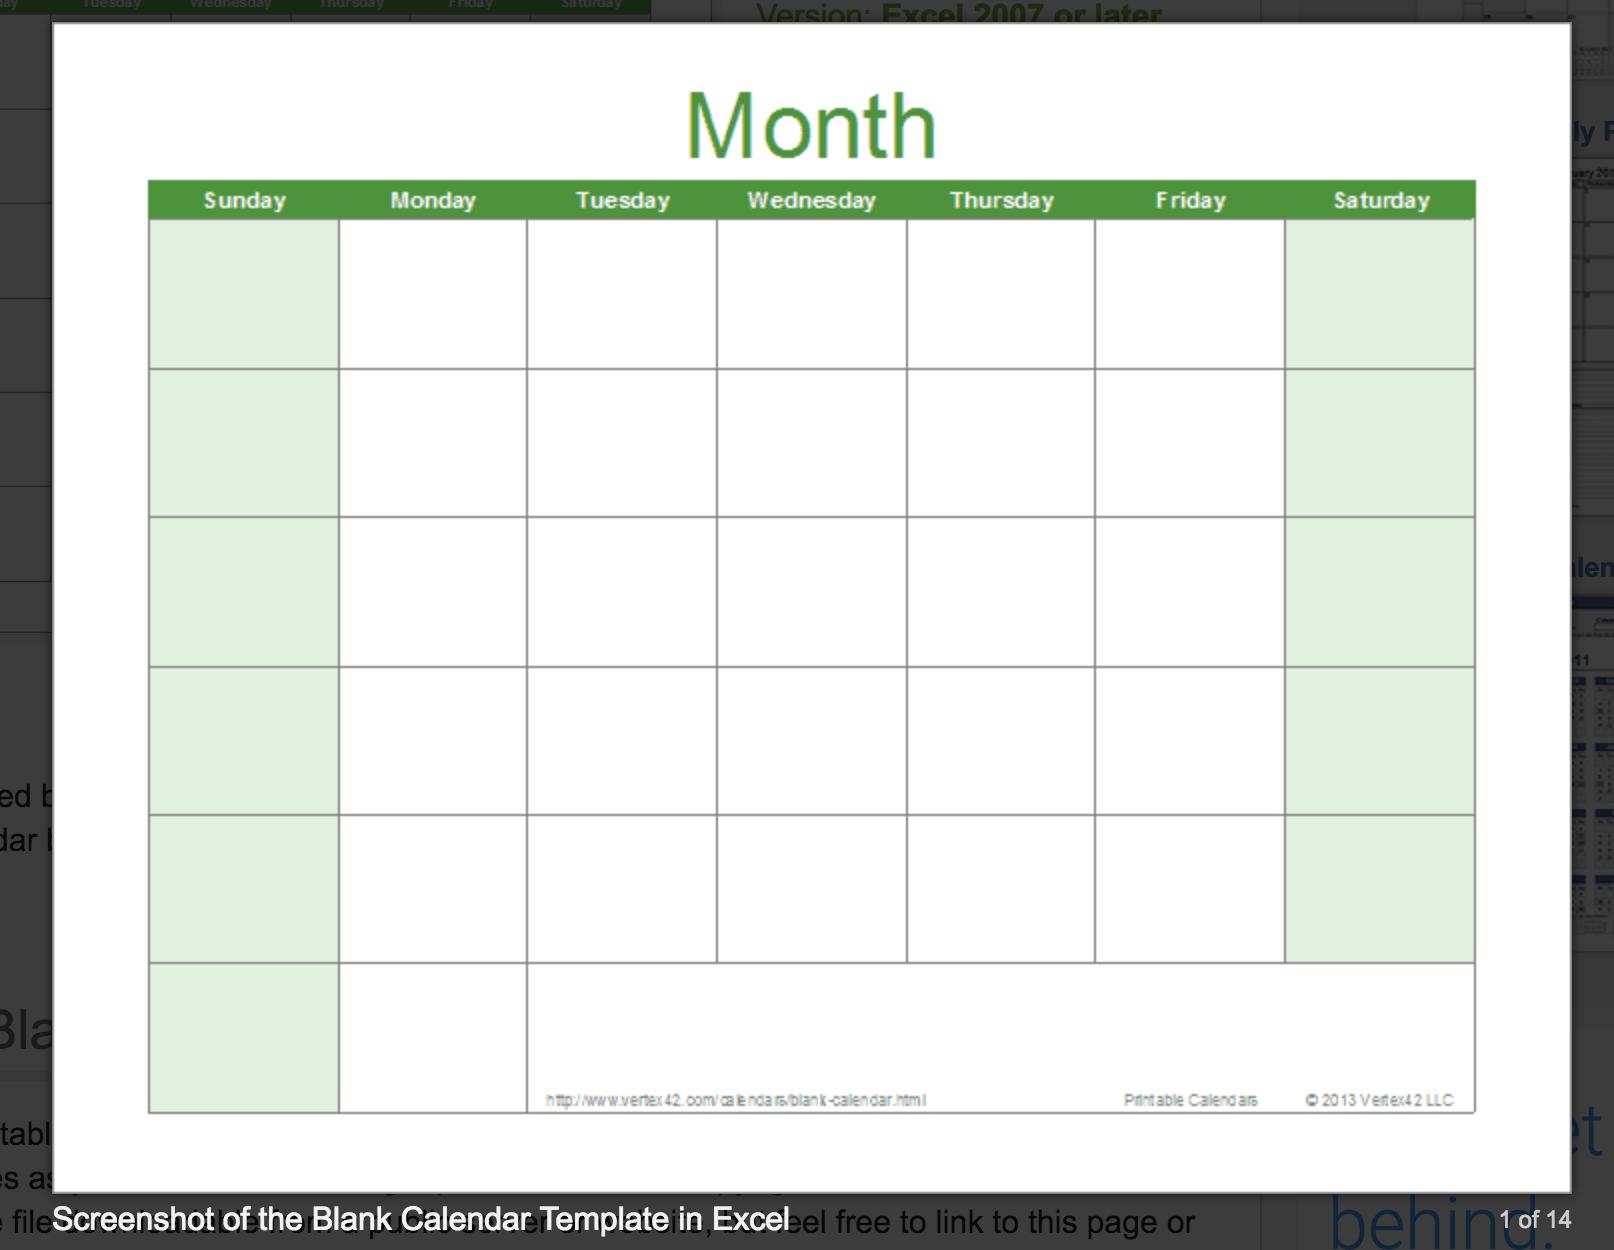 Blank Calendar: Wonderfully Printable 2019 Templates within Template Of A Blank Calendar Of A Month